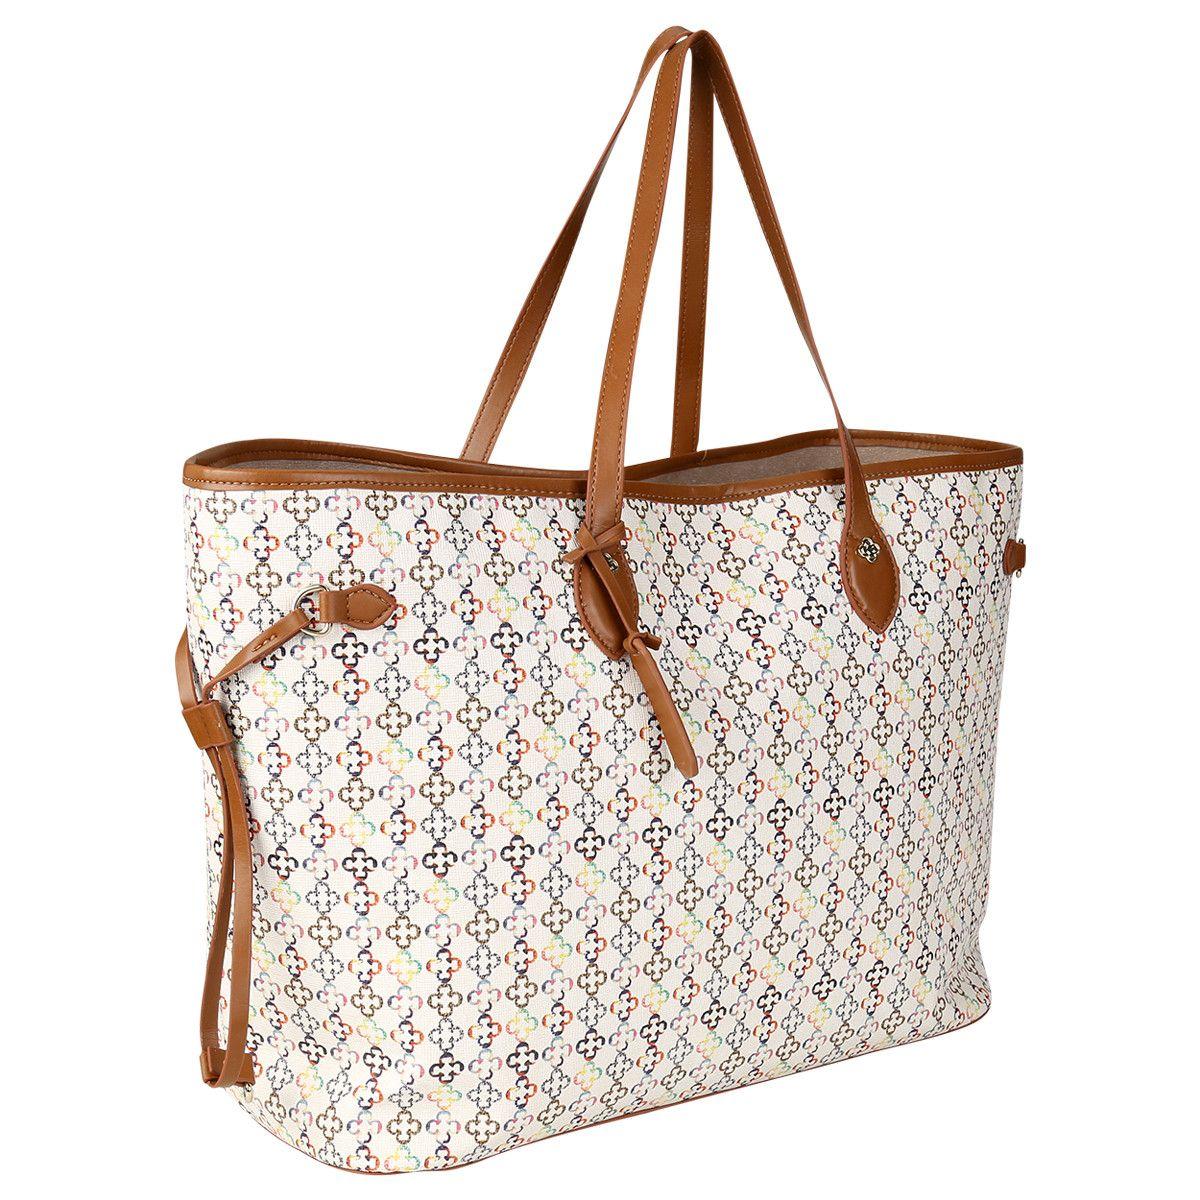 4d55178b9 Bolsa Capodarte Shopper Monograma Off White e Caramelo   Zattini ...